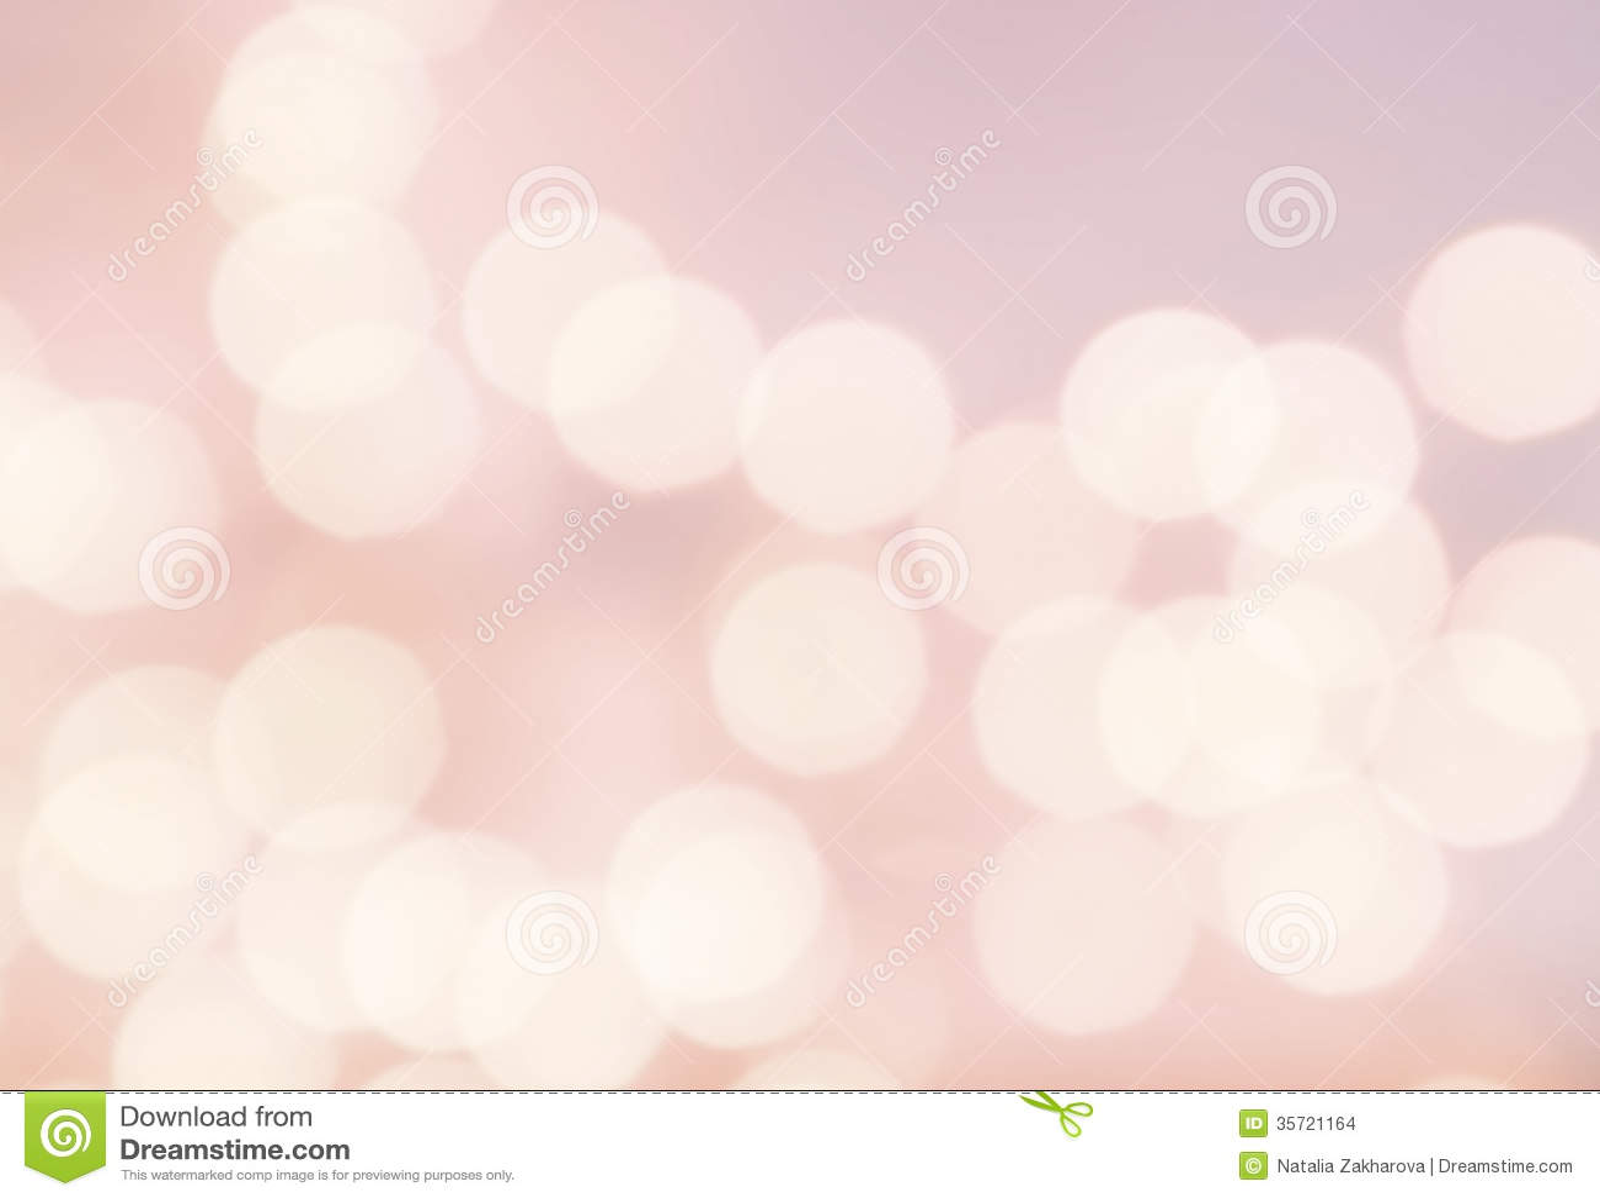 Bokeh光葡萄酒背景。明亮的桃红色颜色。抽象natu